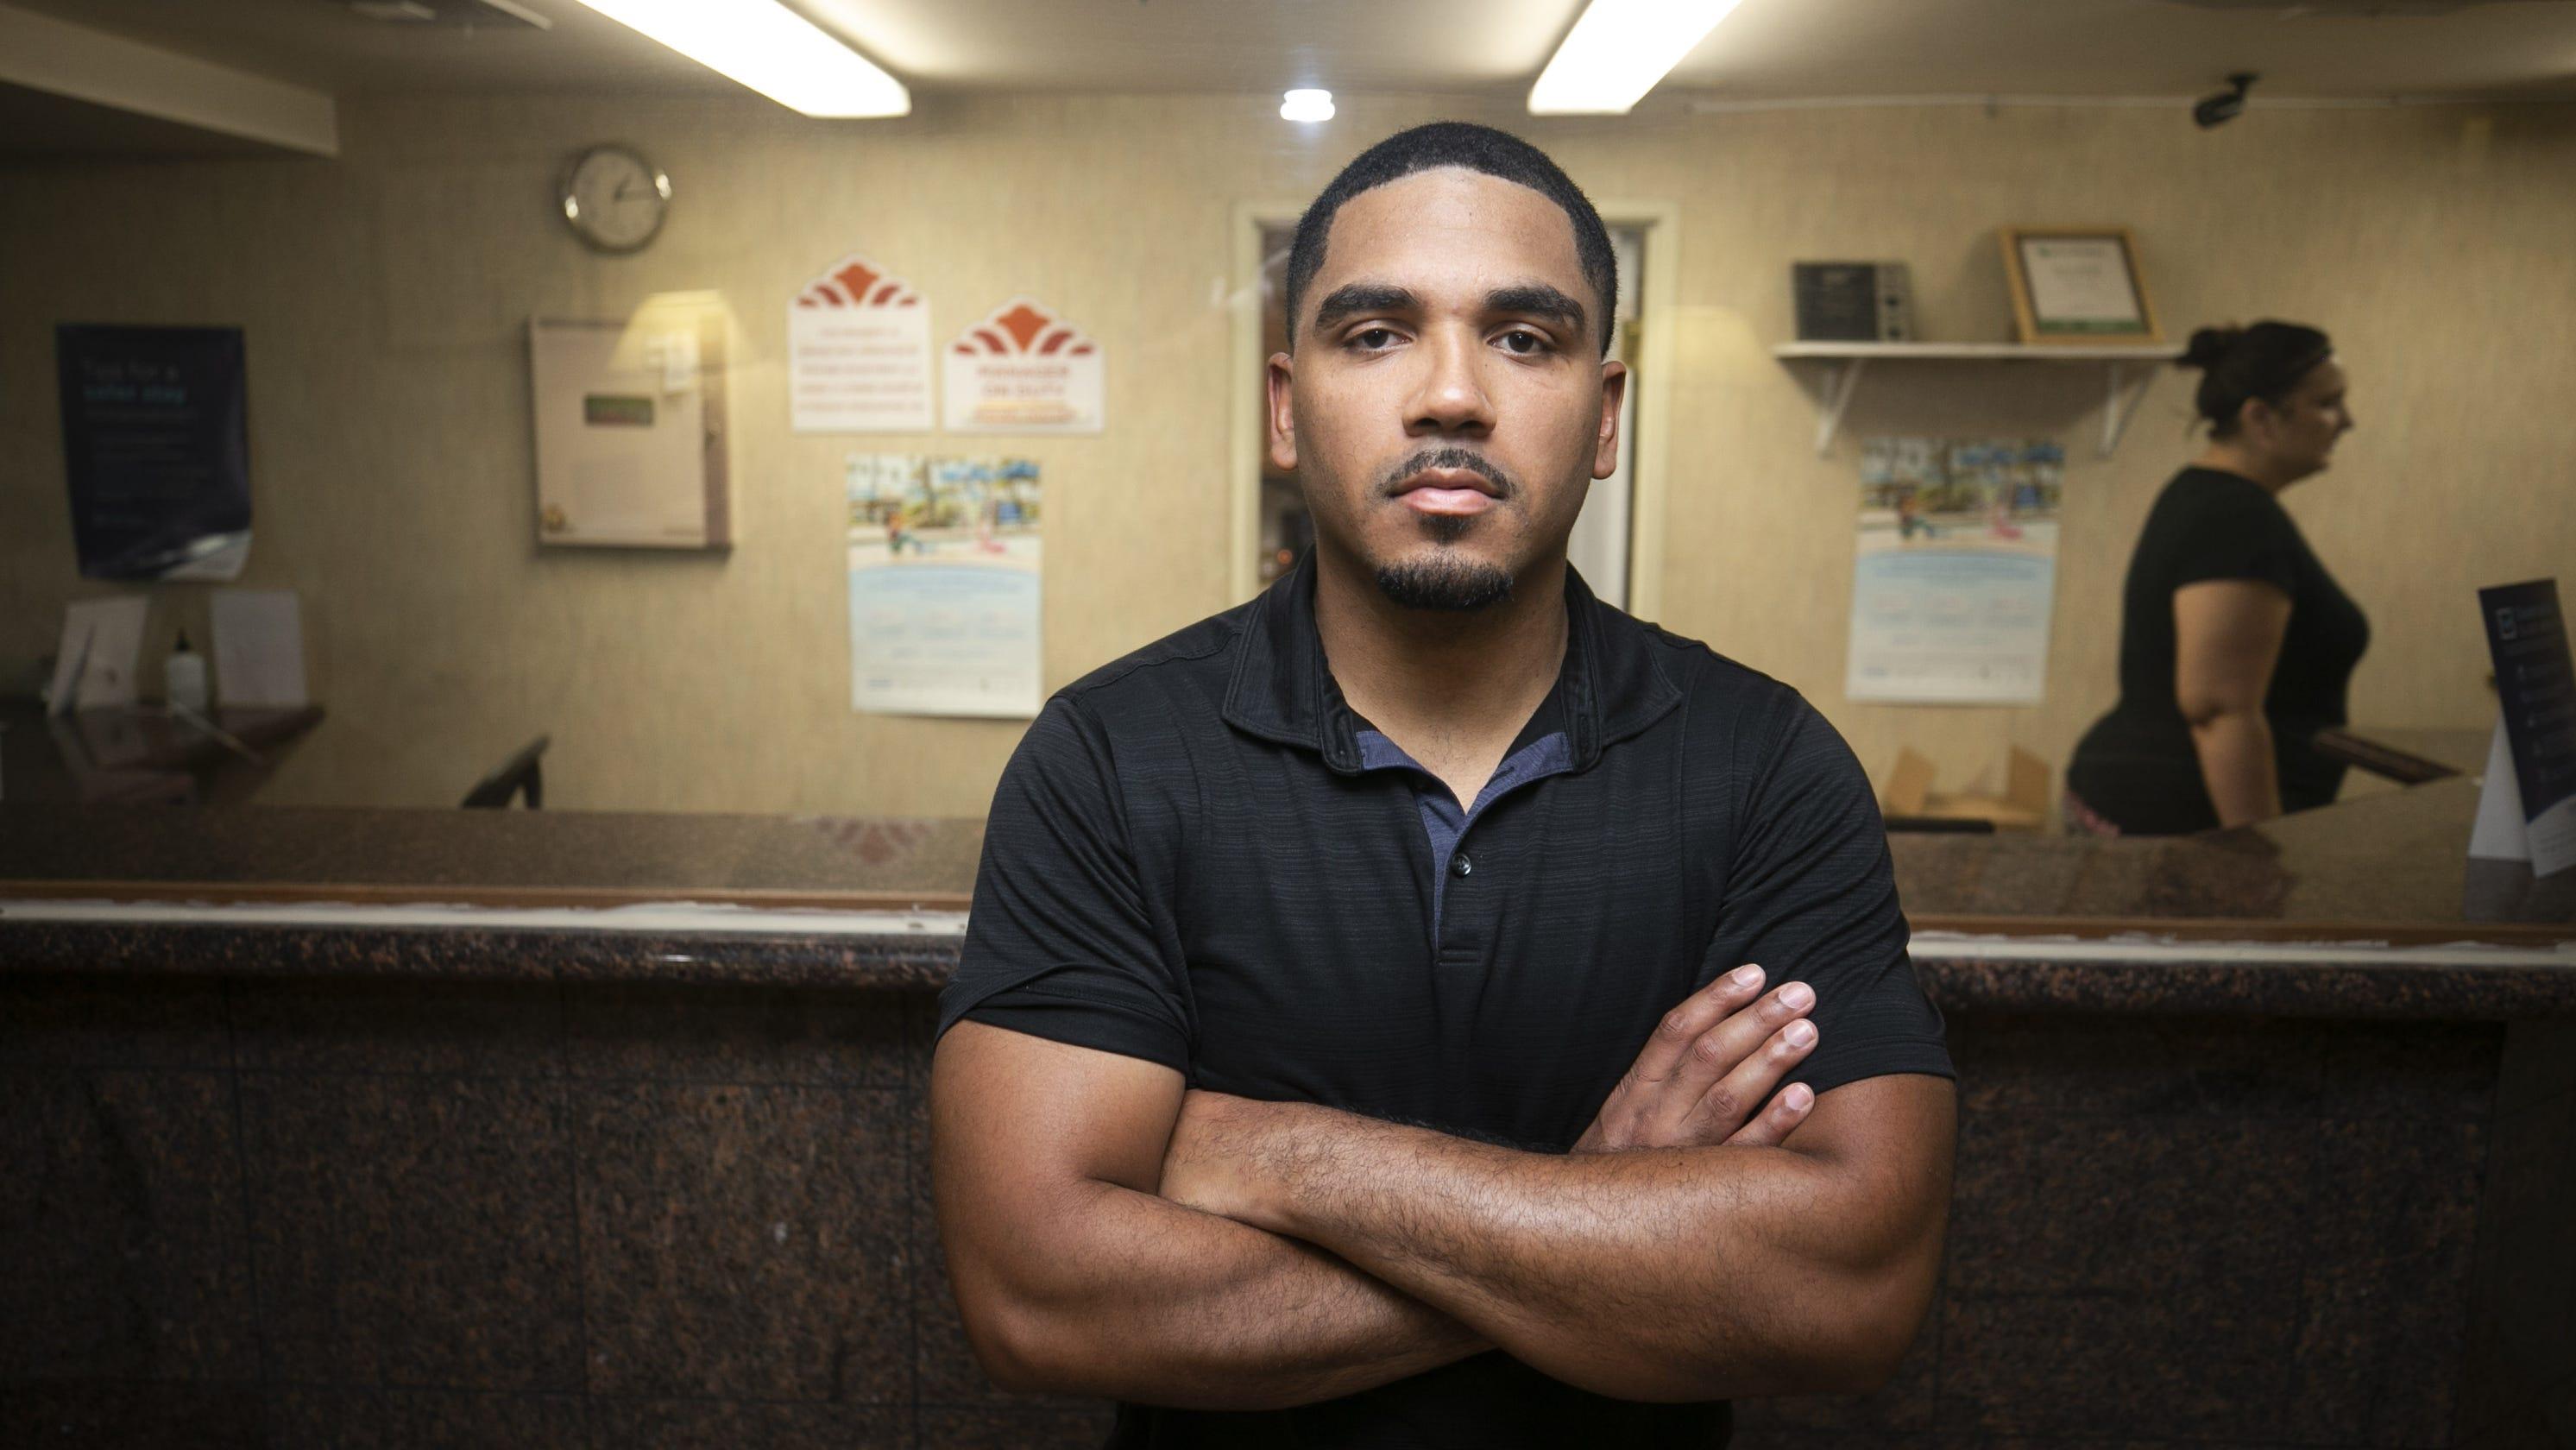 Man held at gunpoint by police hires Benjamin Crump, wants $2.5 million from Arizona city